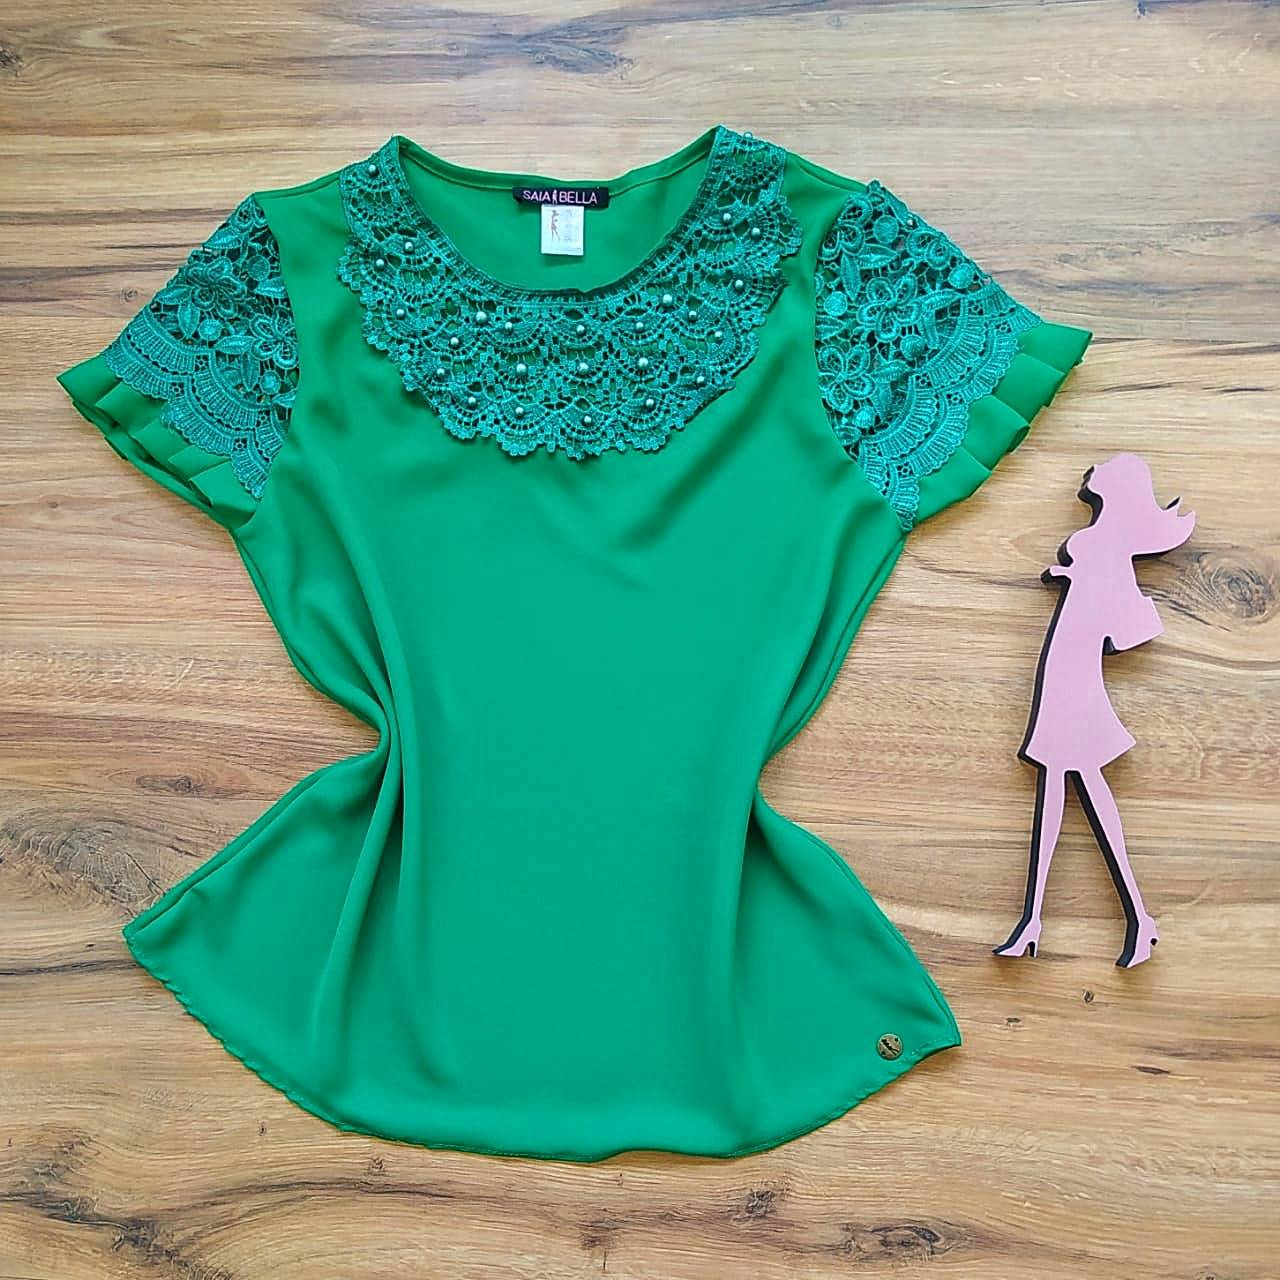 Blusa Estela de Renda Saia Bella - SB79904 verde